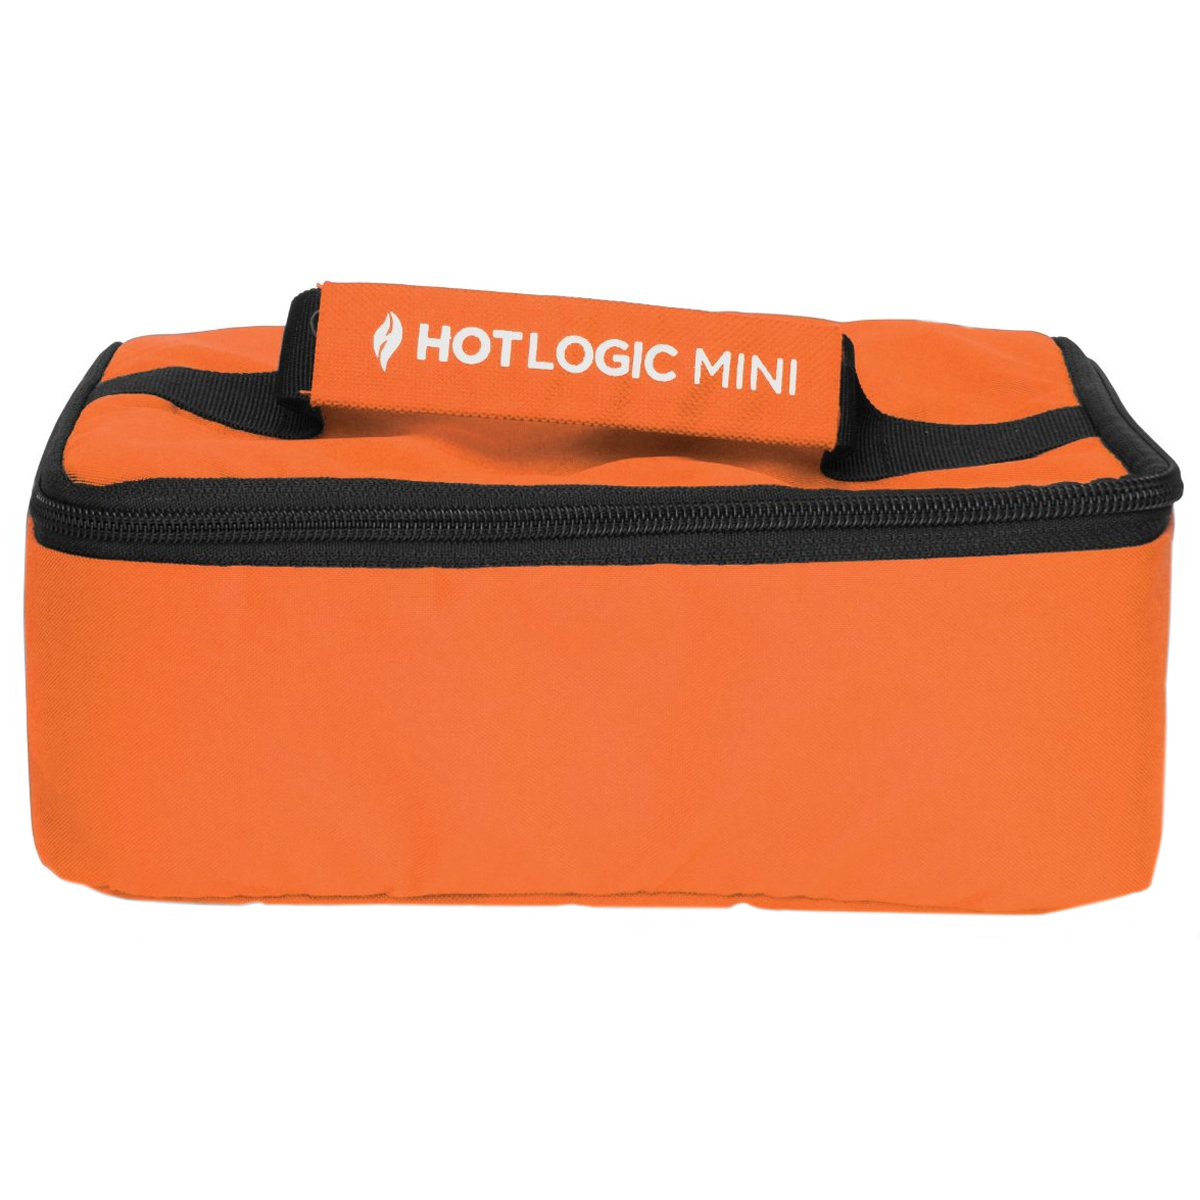 HotLogic Mini Personal Portable Oven, Orange